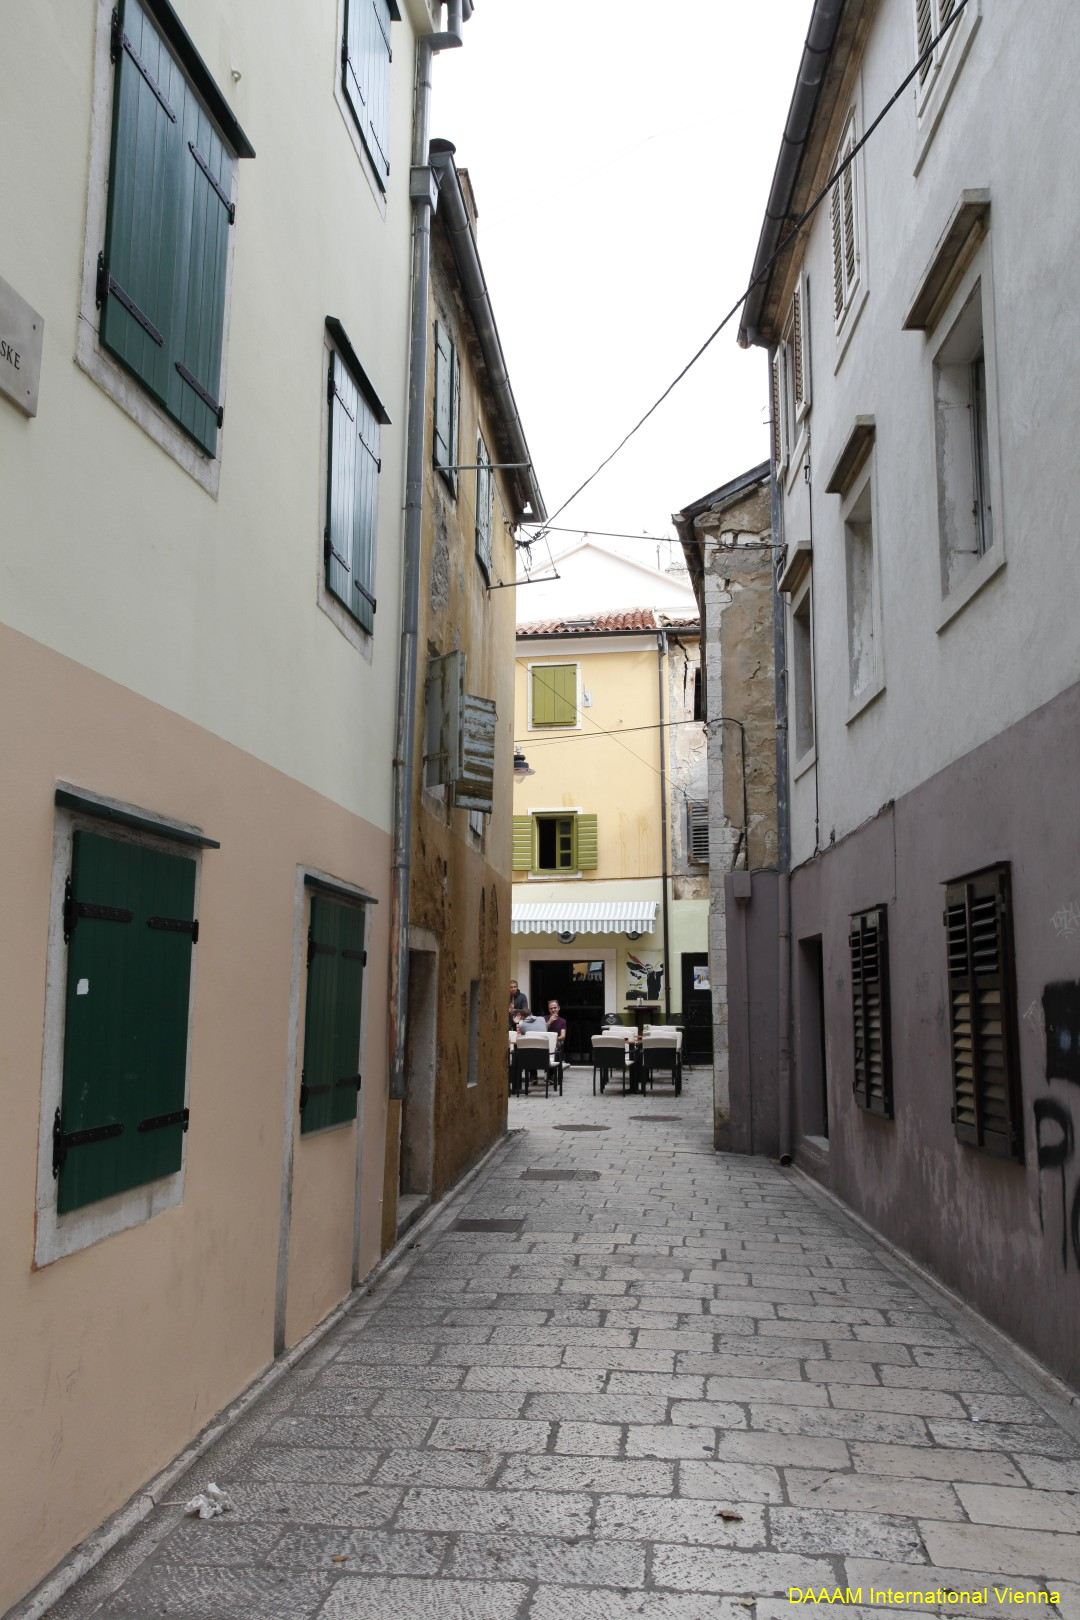 DAAAM_2012_Zadar_00_Zadar_City_019